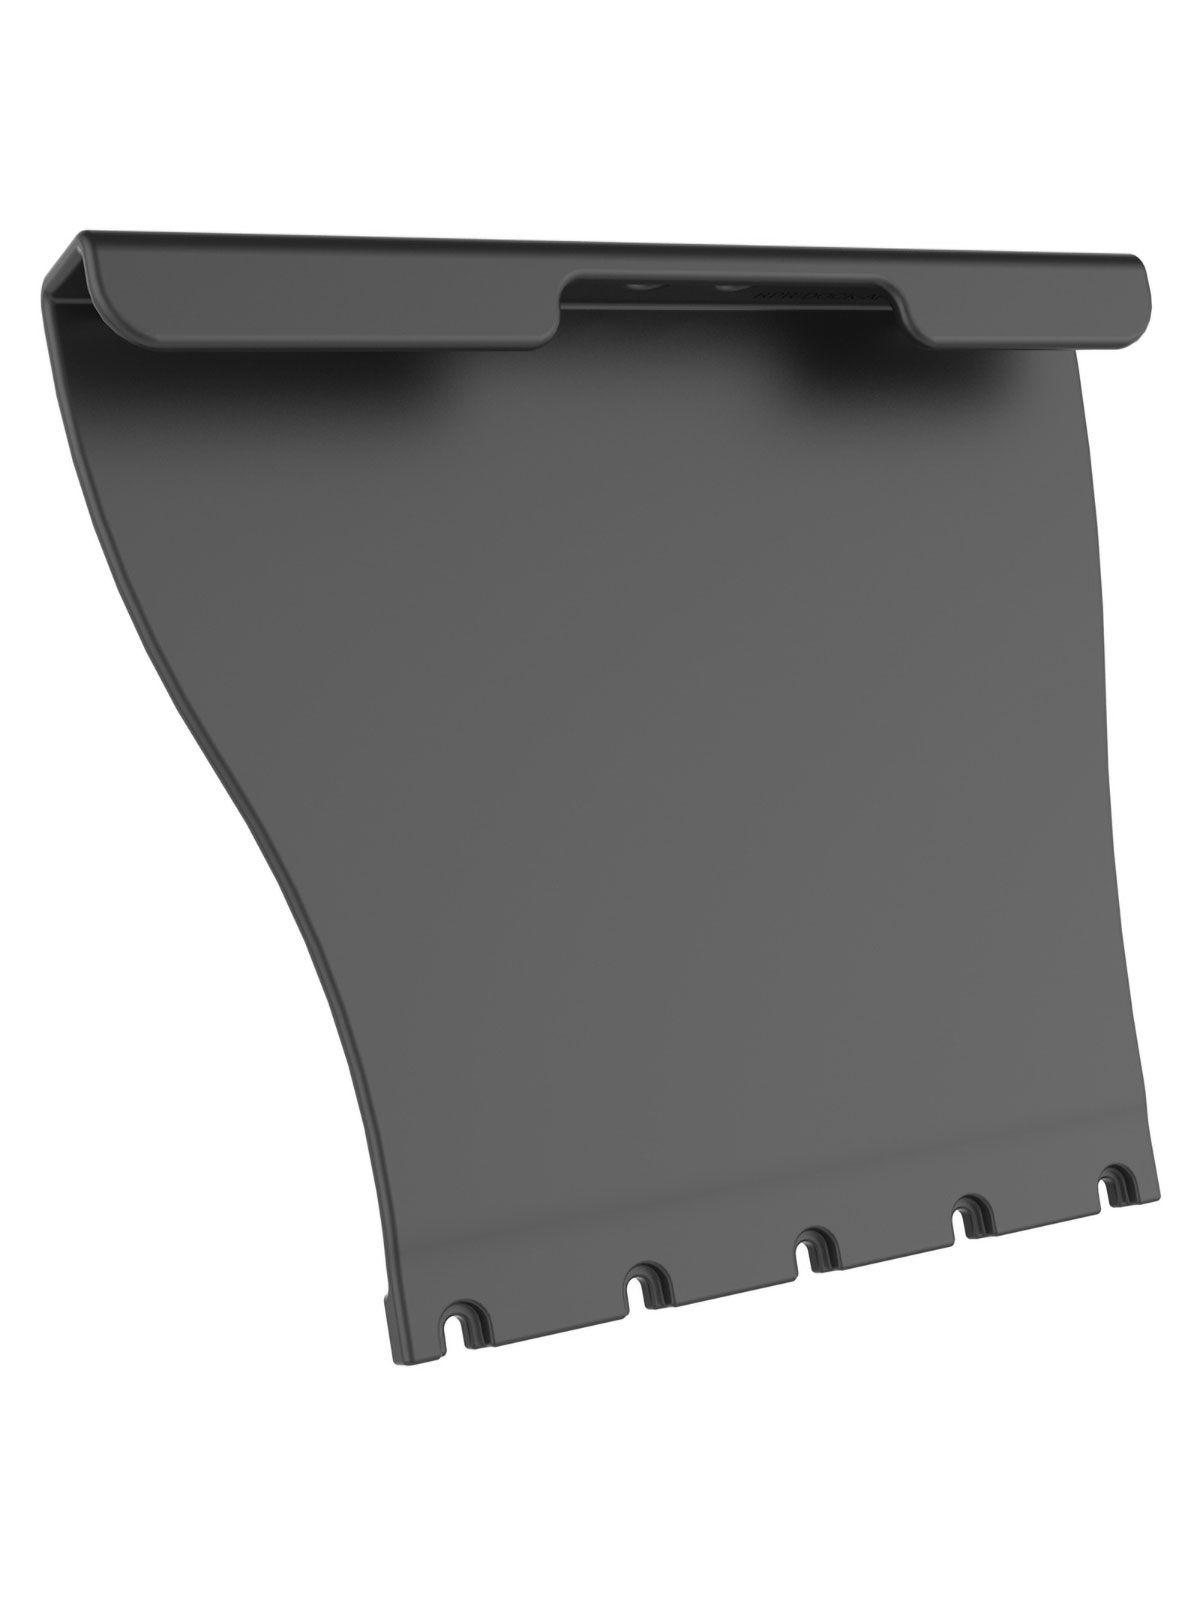 RAM Mounts Endkappe (oben) für GDS Dockingstation Apple iPad Pro 12.9 (3. Generation)